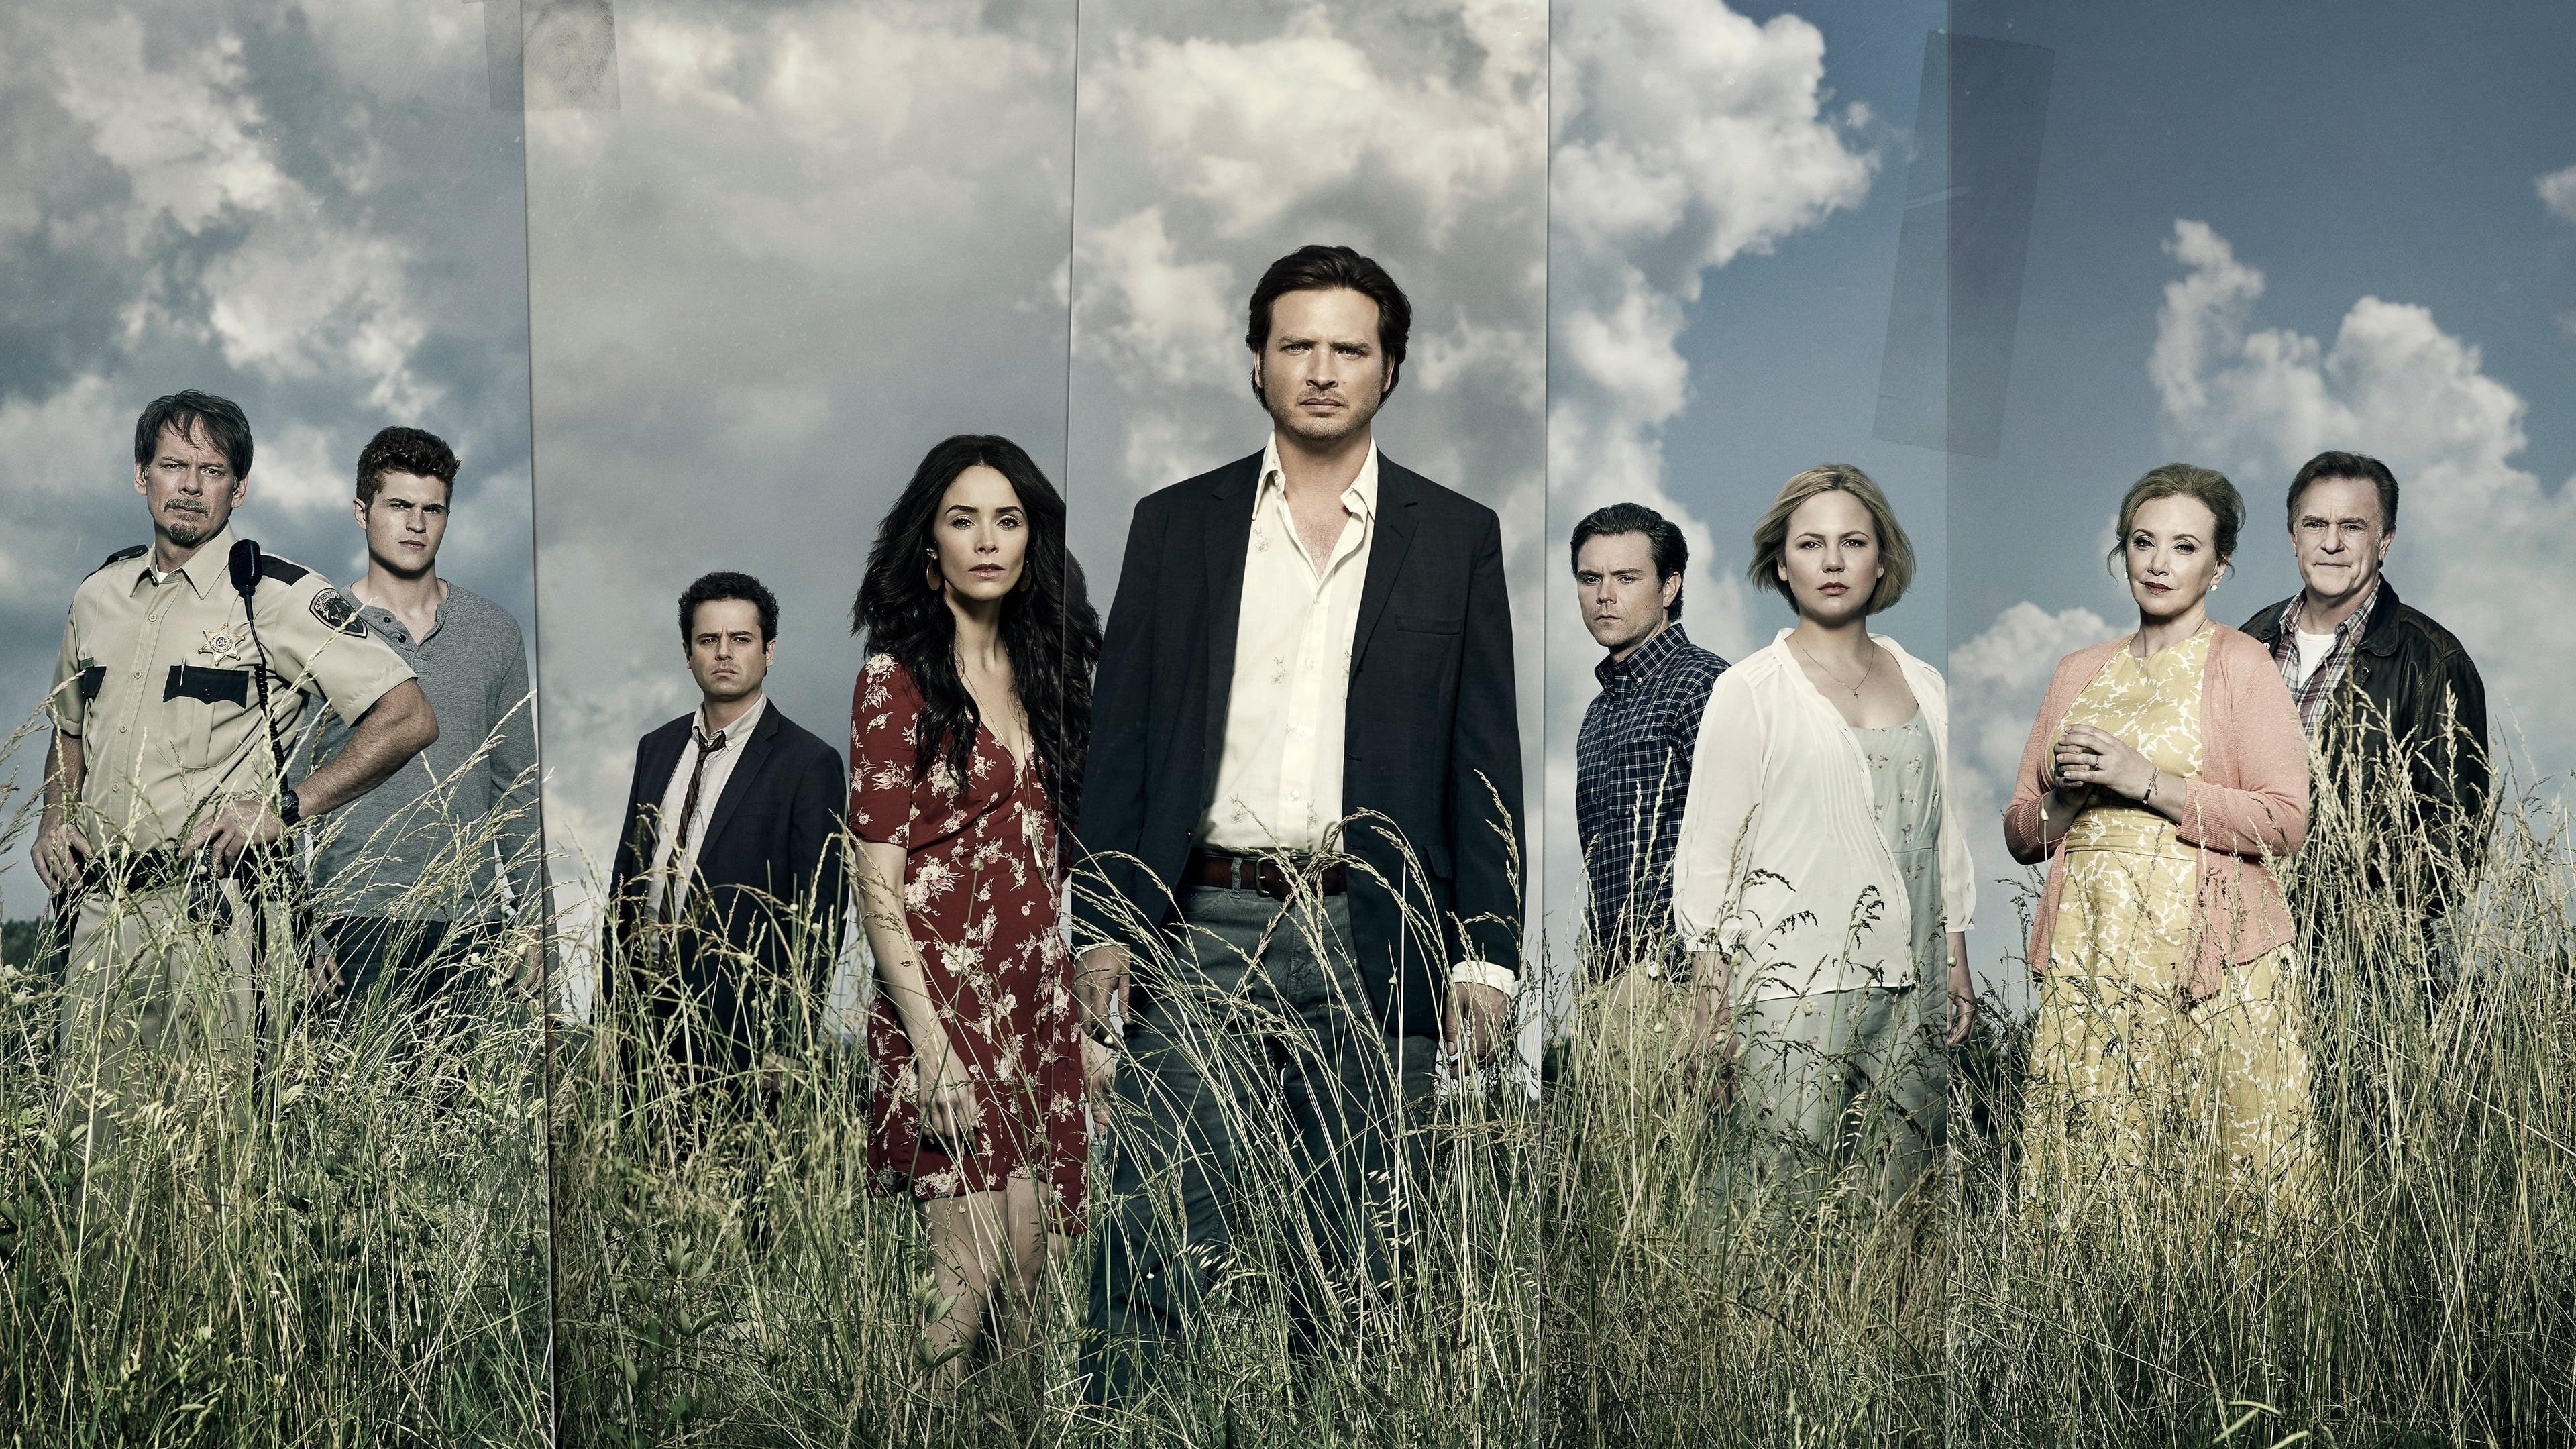 Premiere date second season 'Rectify' announced